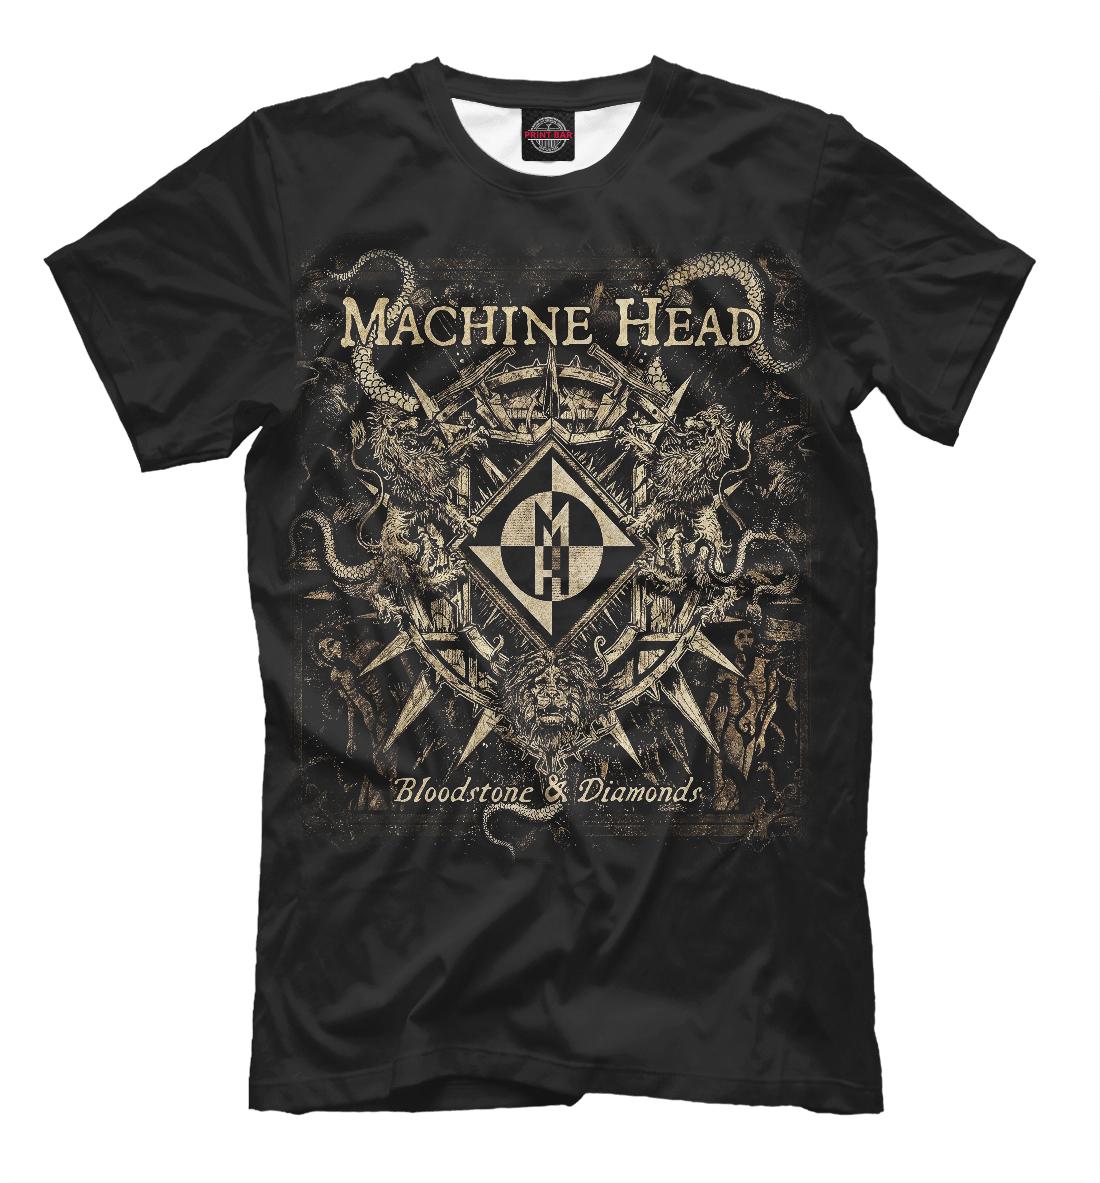 Купить Machine Head, Printbar, Футболки, MZK-477891-fut-2